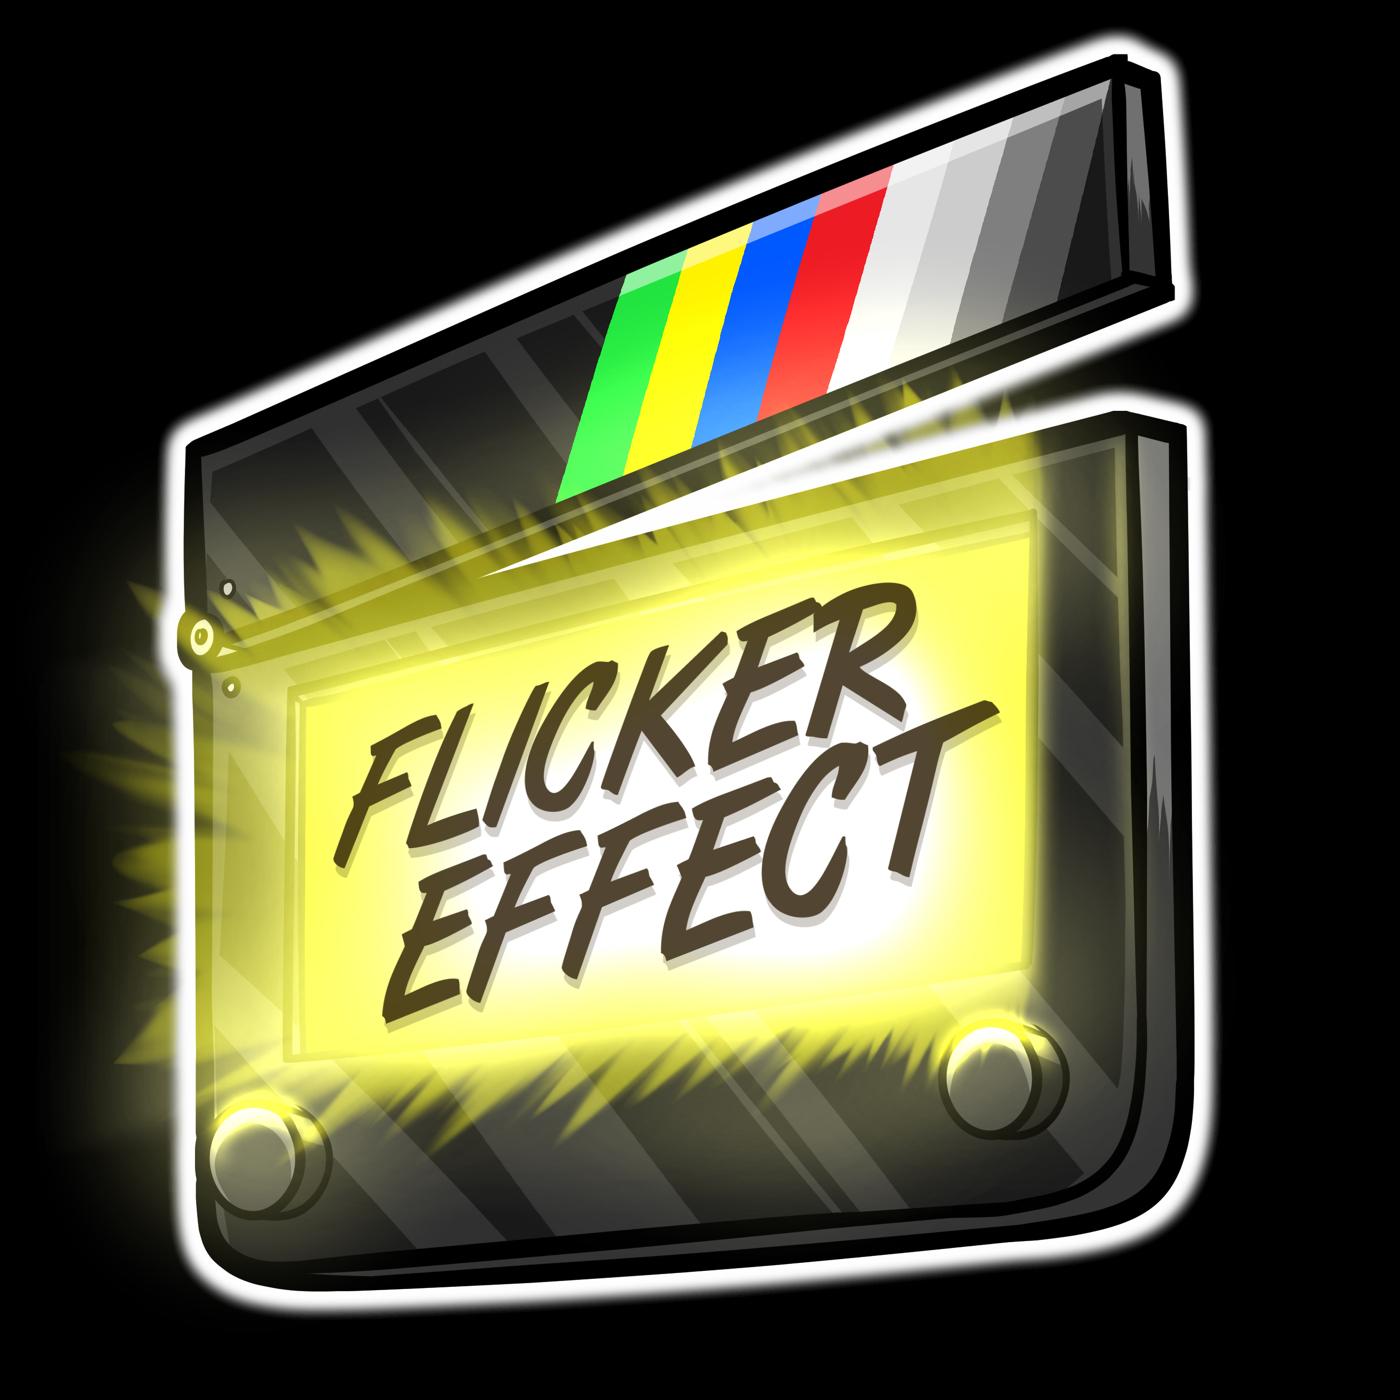 Flicker Effect show art